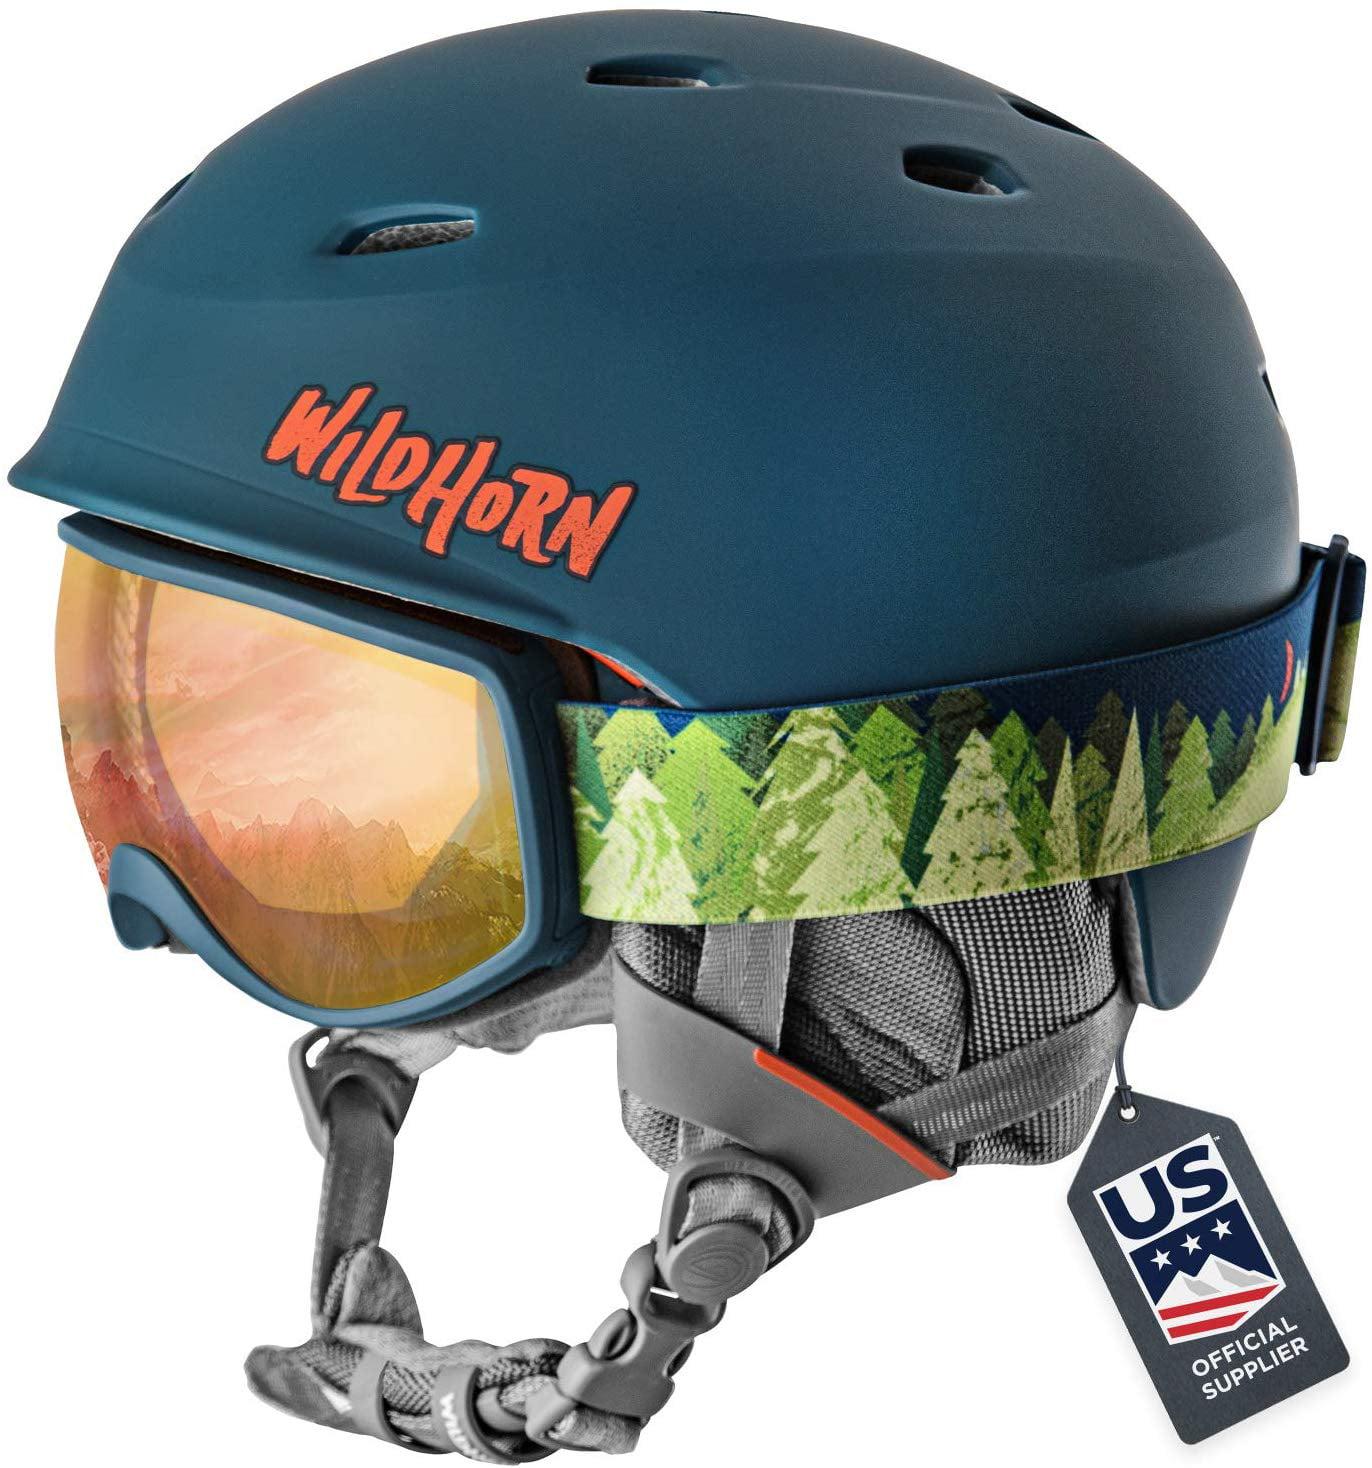 Wildhorn Spire Snow /& Ski Helmet w//Goggles Kids Youth ASTM Certified